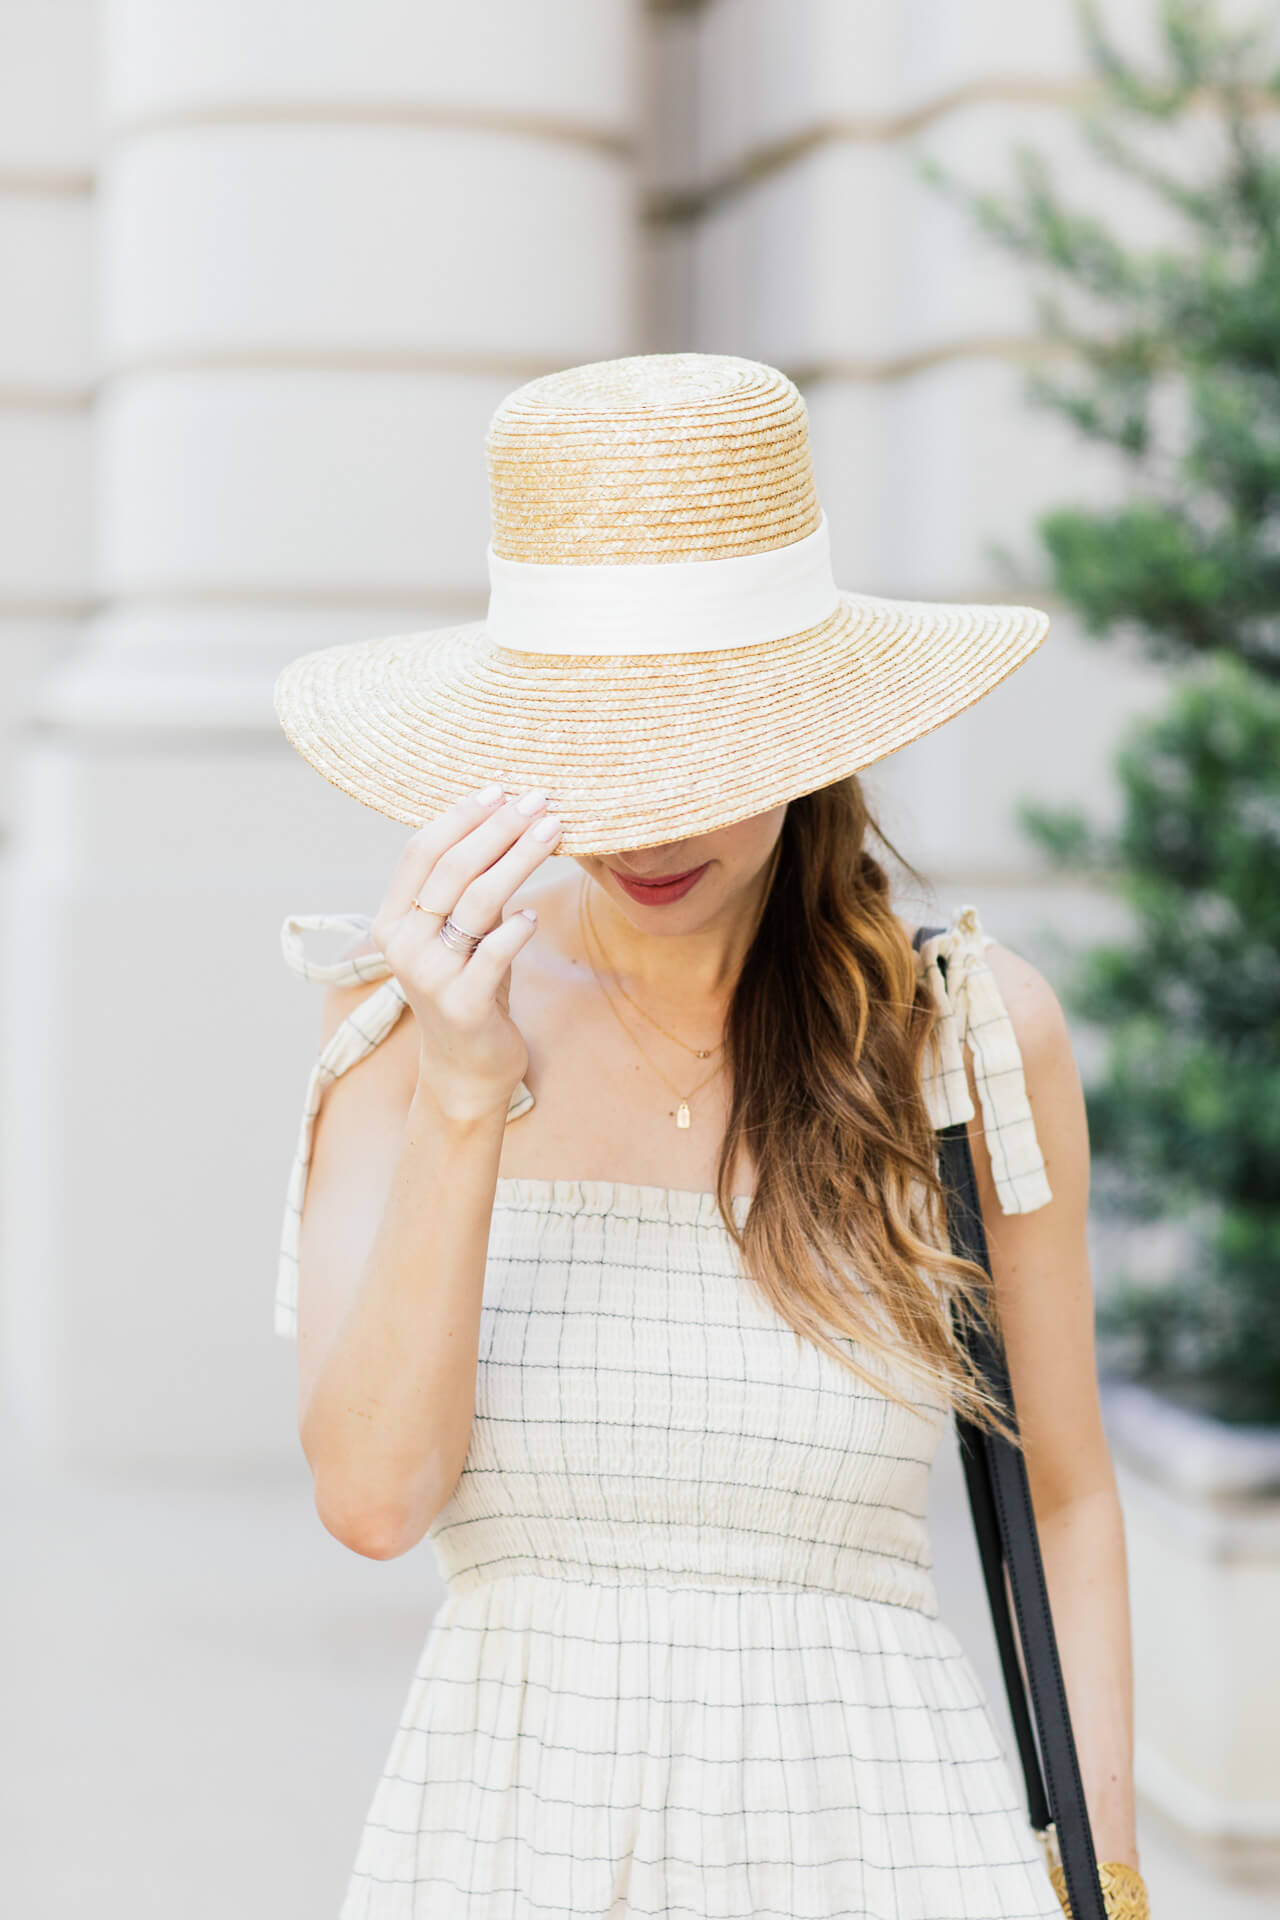 Beautiful straw hat from Jcrew